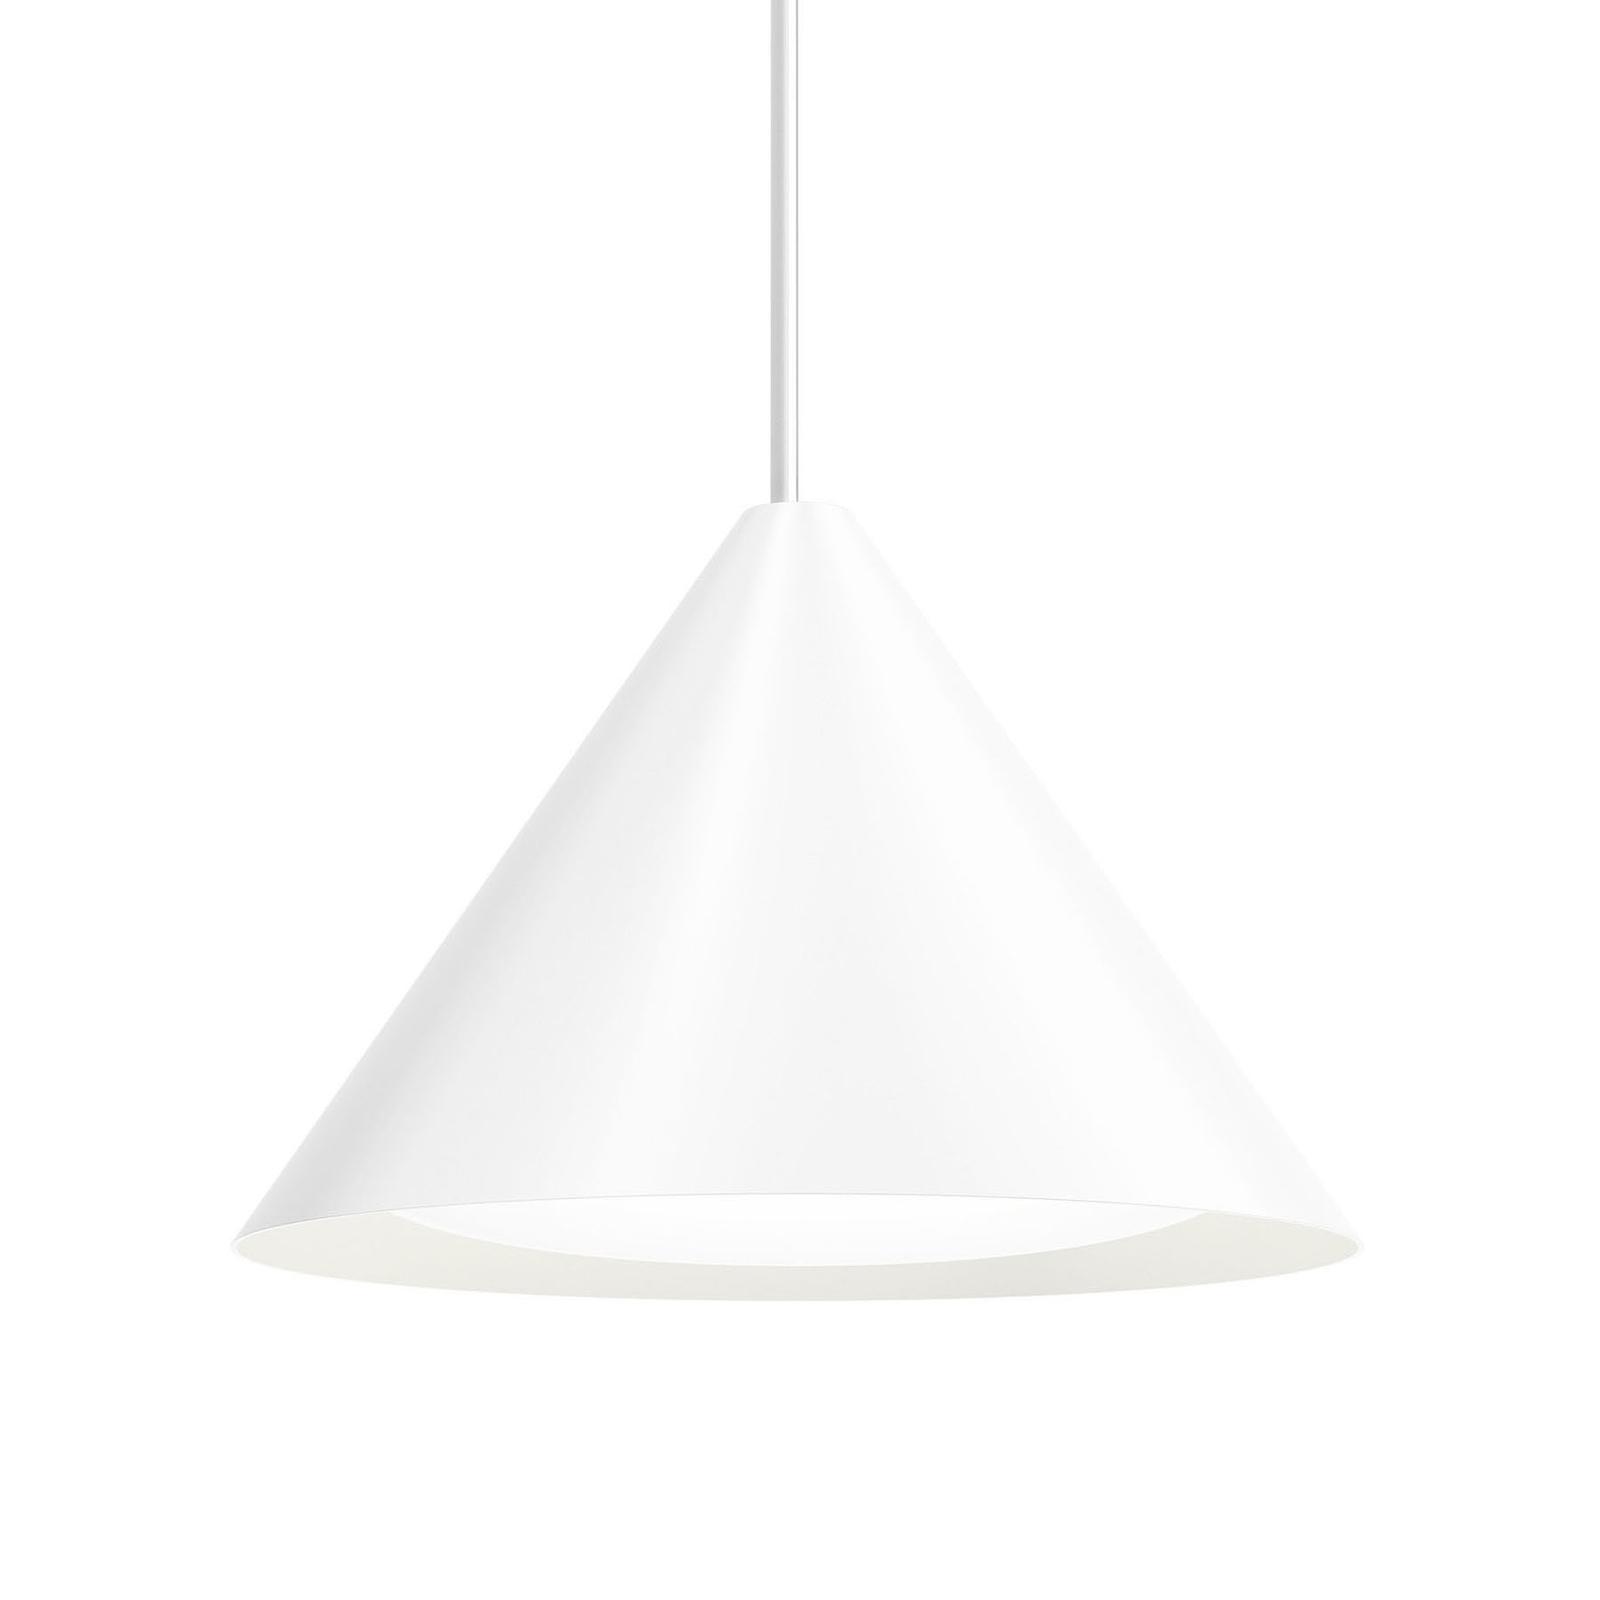 Louis Poulsen Keglen LED sospensione 40cm bianco